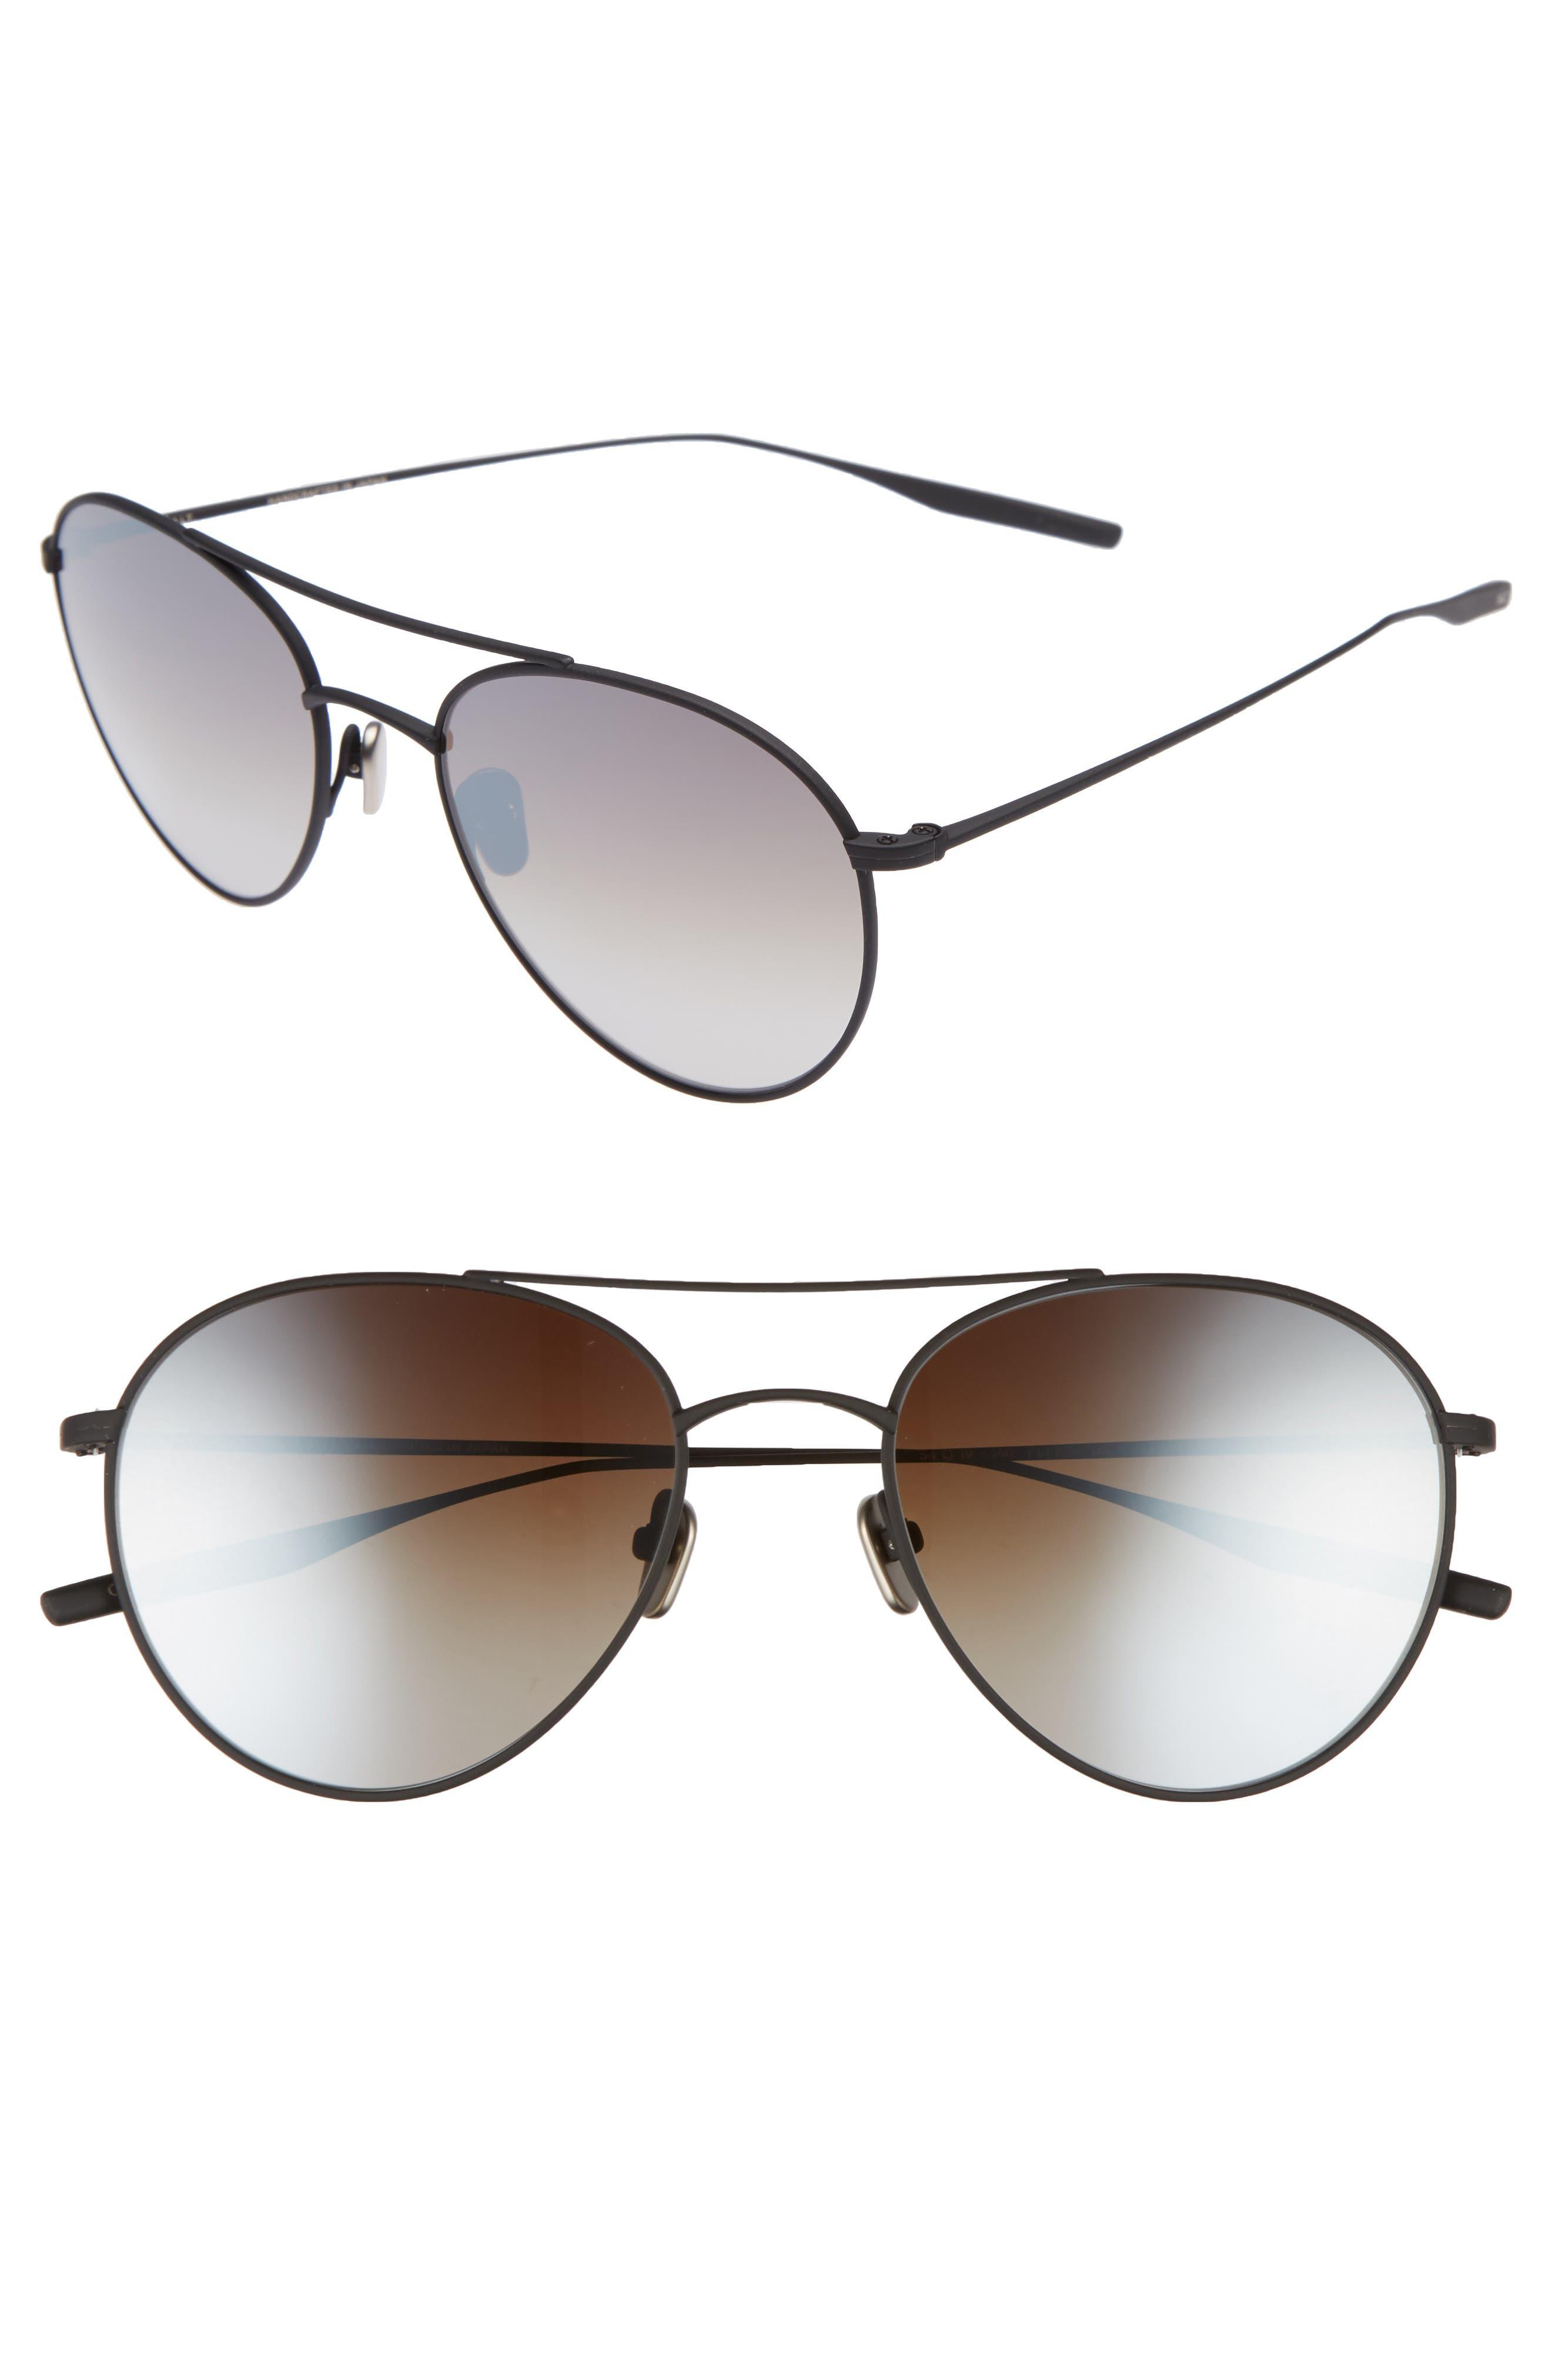 Fufkin 54mm Polarized Round Sunglasses,                             Main thumbnail 1, color,                             Black Sand